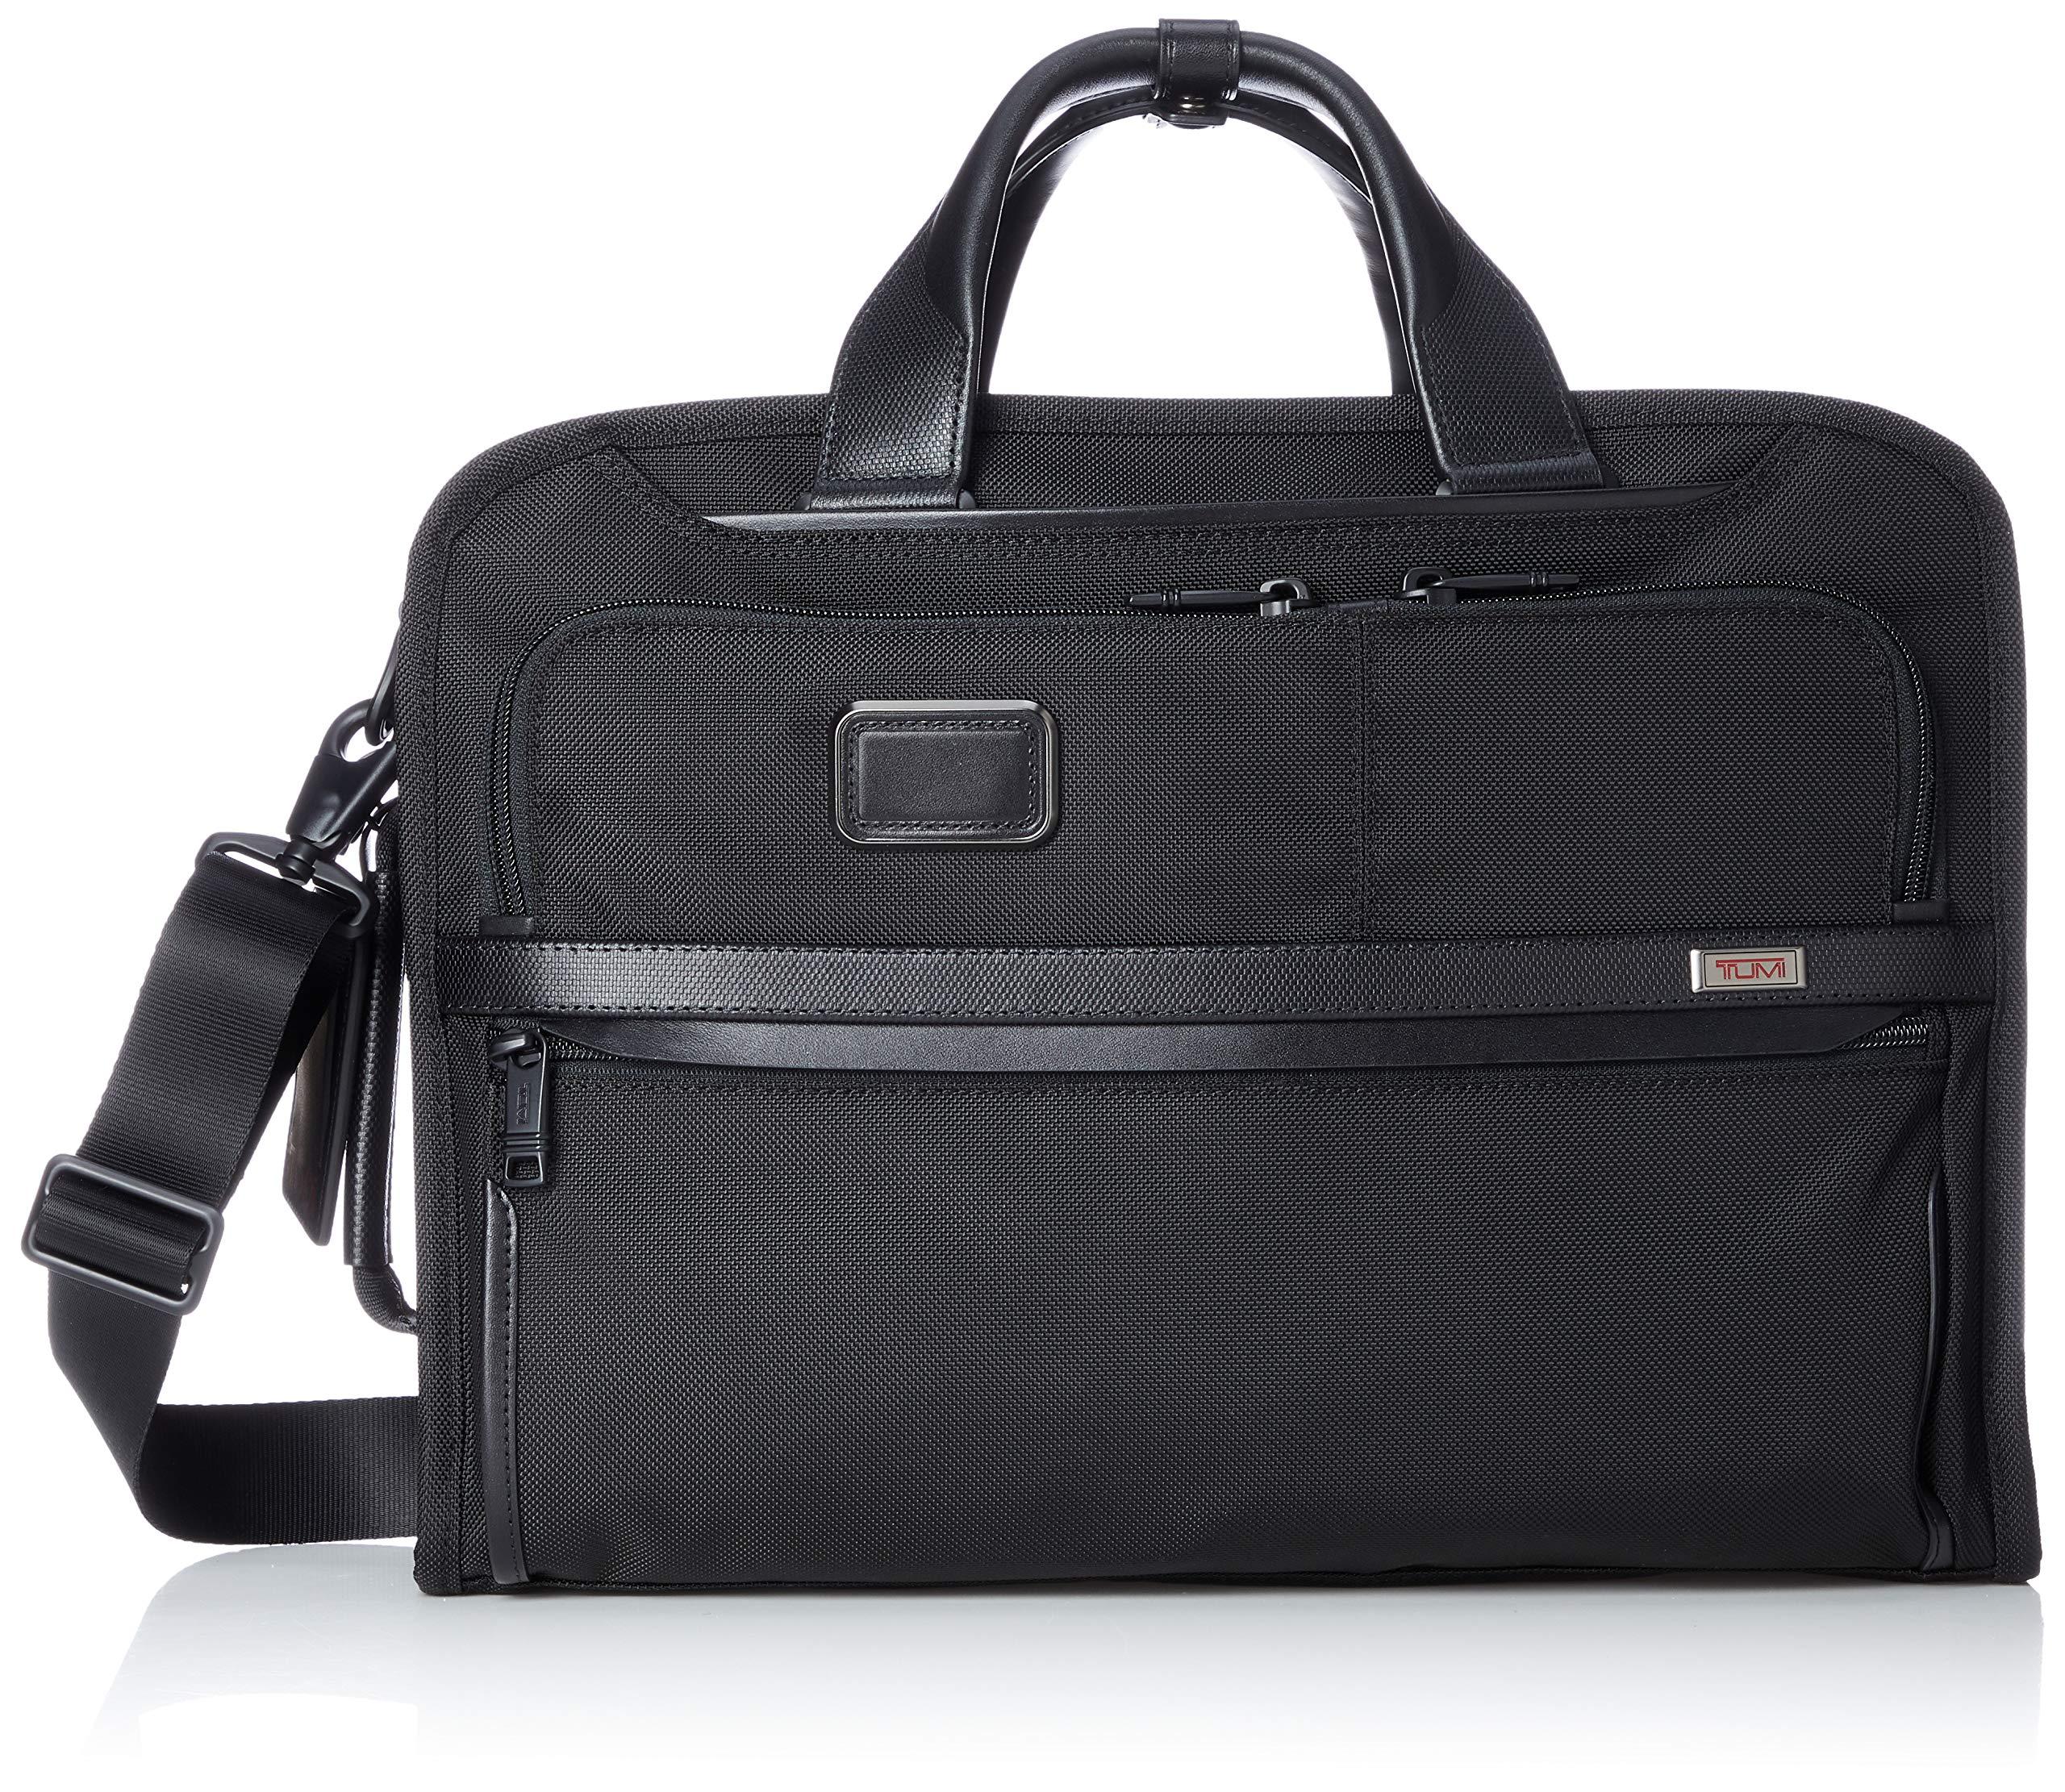 TUMI - Alpha 3 Slim Three Way Laptop Brief Briefcase - 15 Inch Computer Bag for Men and Women - Black